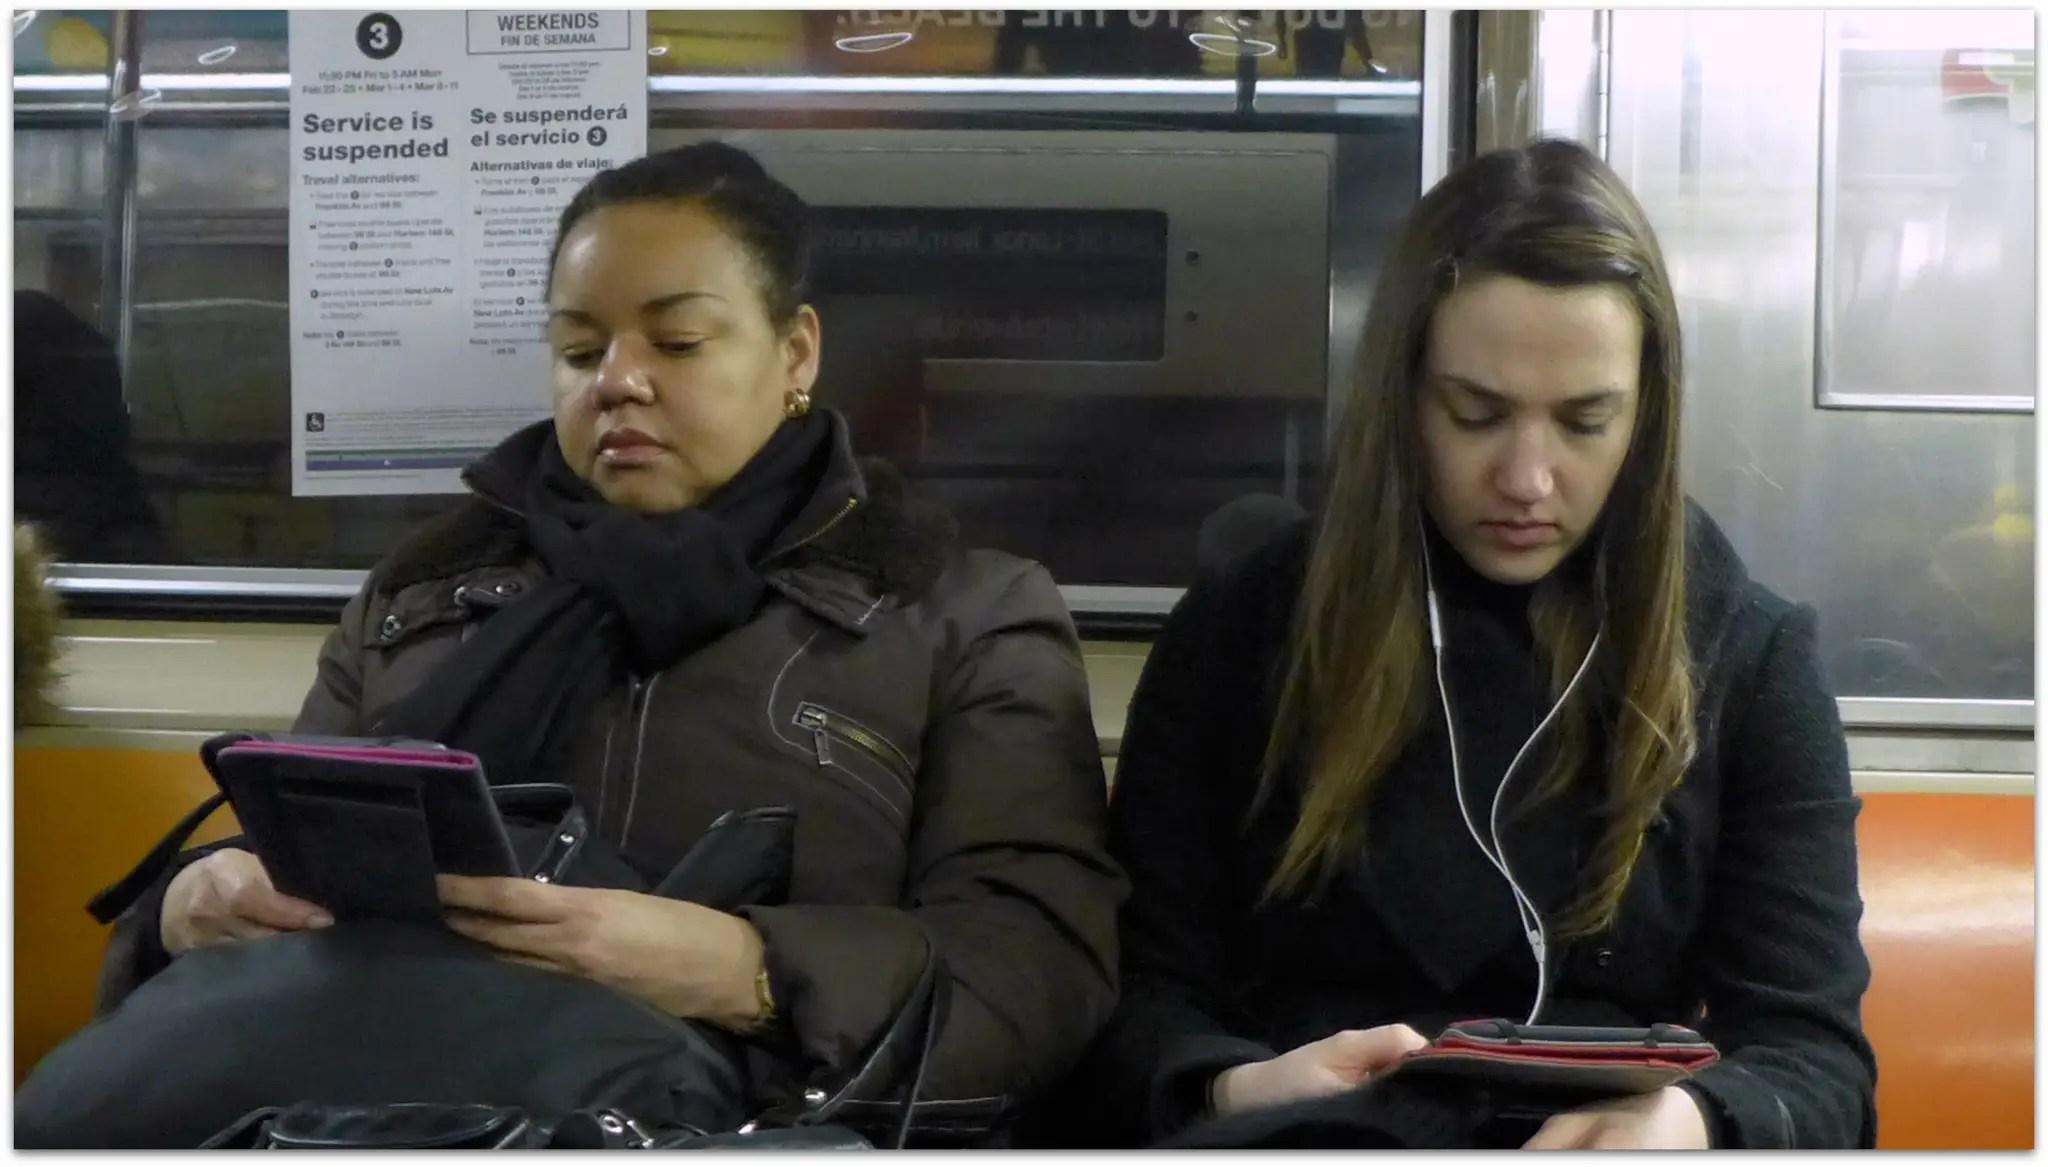 women reading on kindle